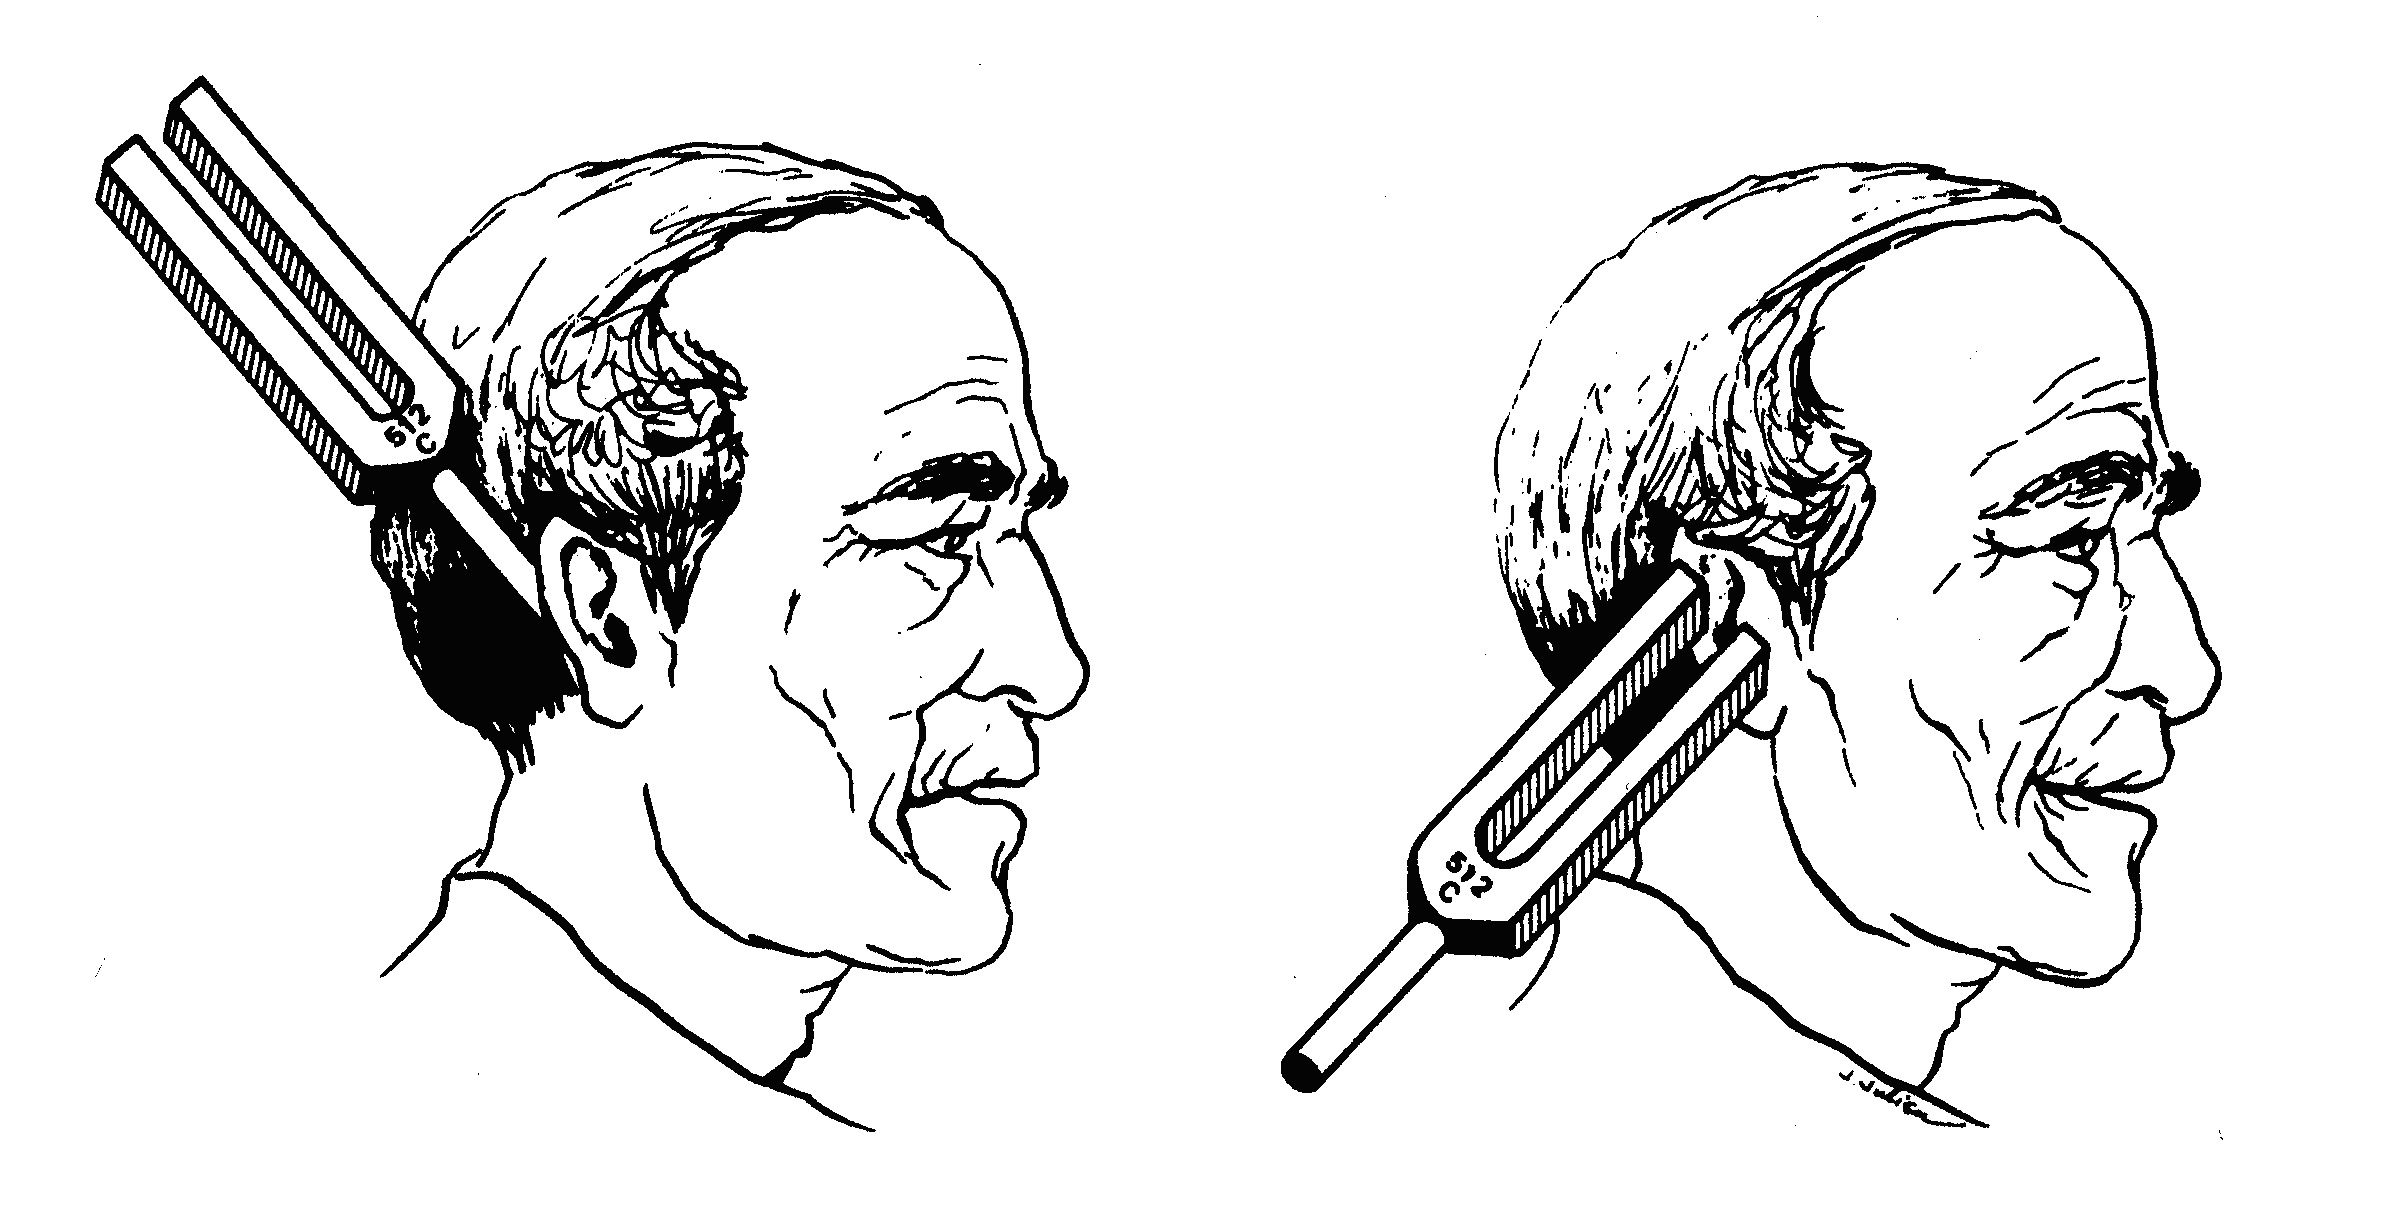 Daily Nursing Trivia Difference Between Caput Succedaneum And Cephalhematoma Plus 2 More